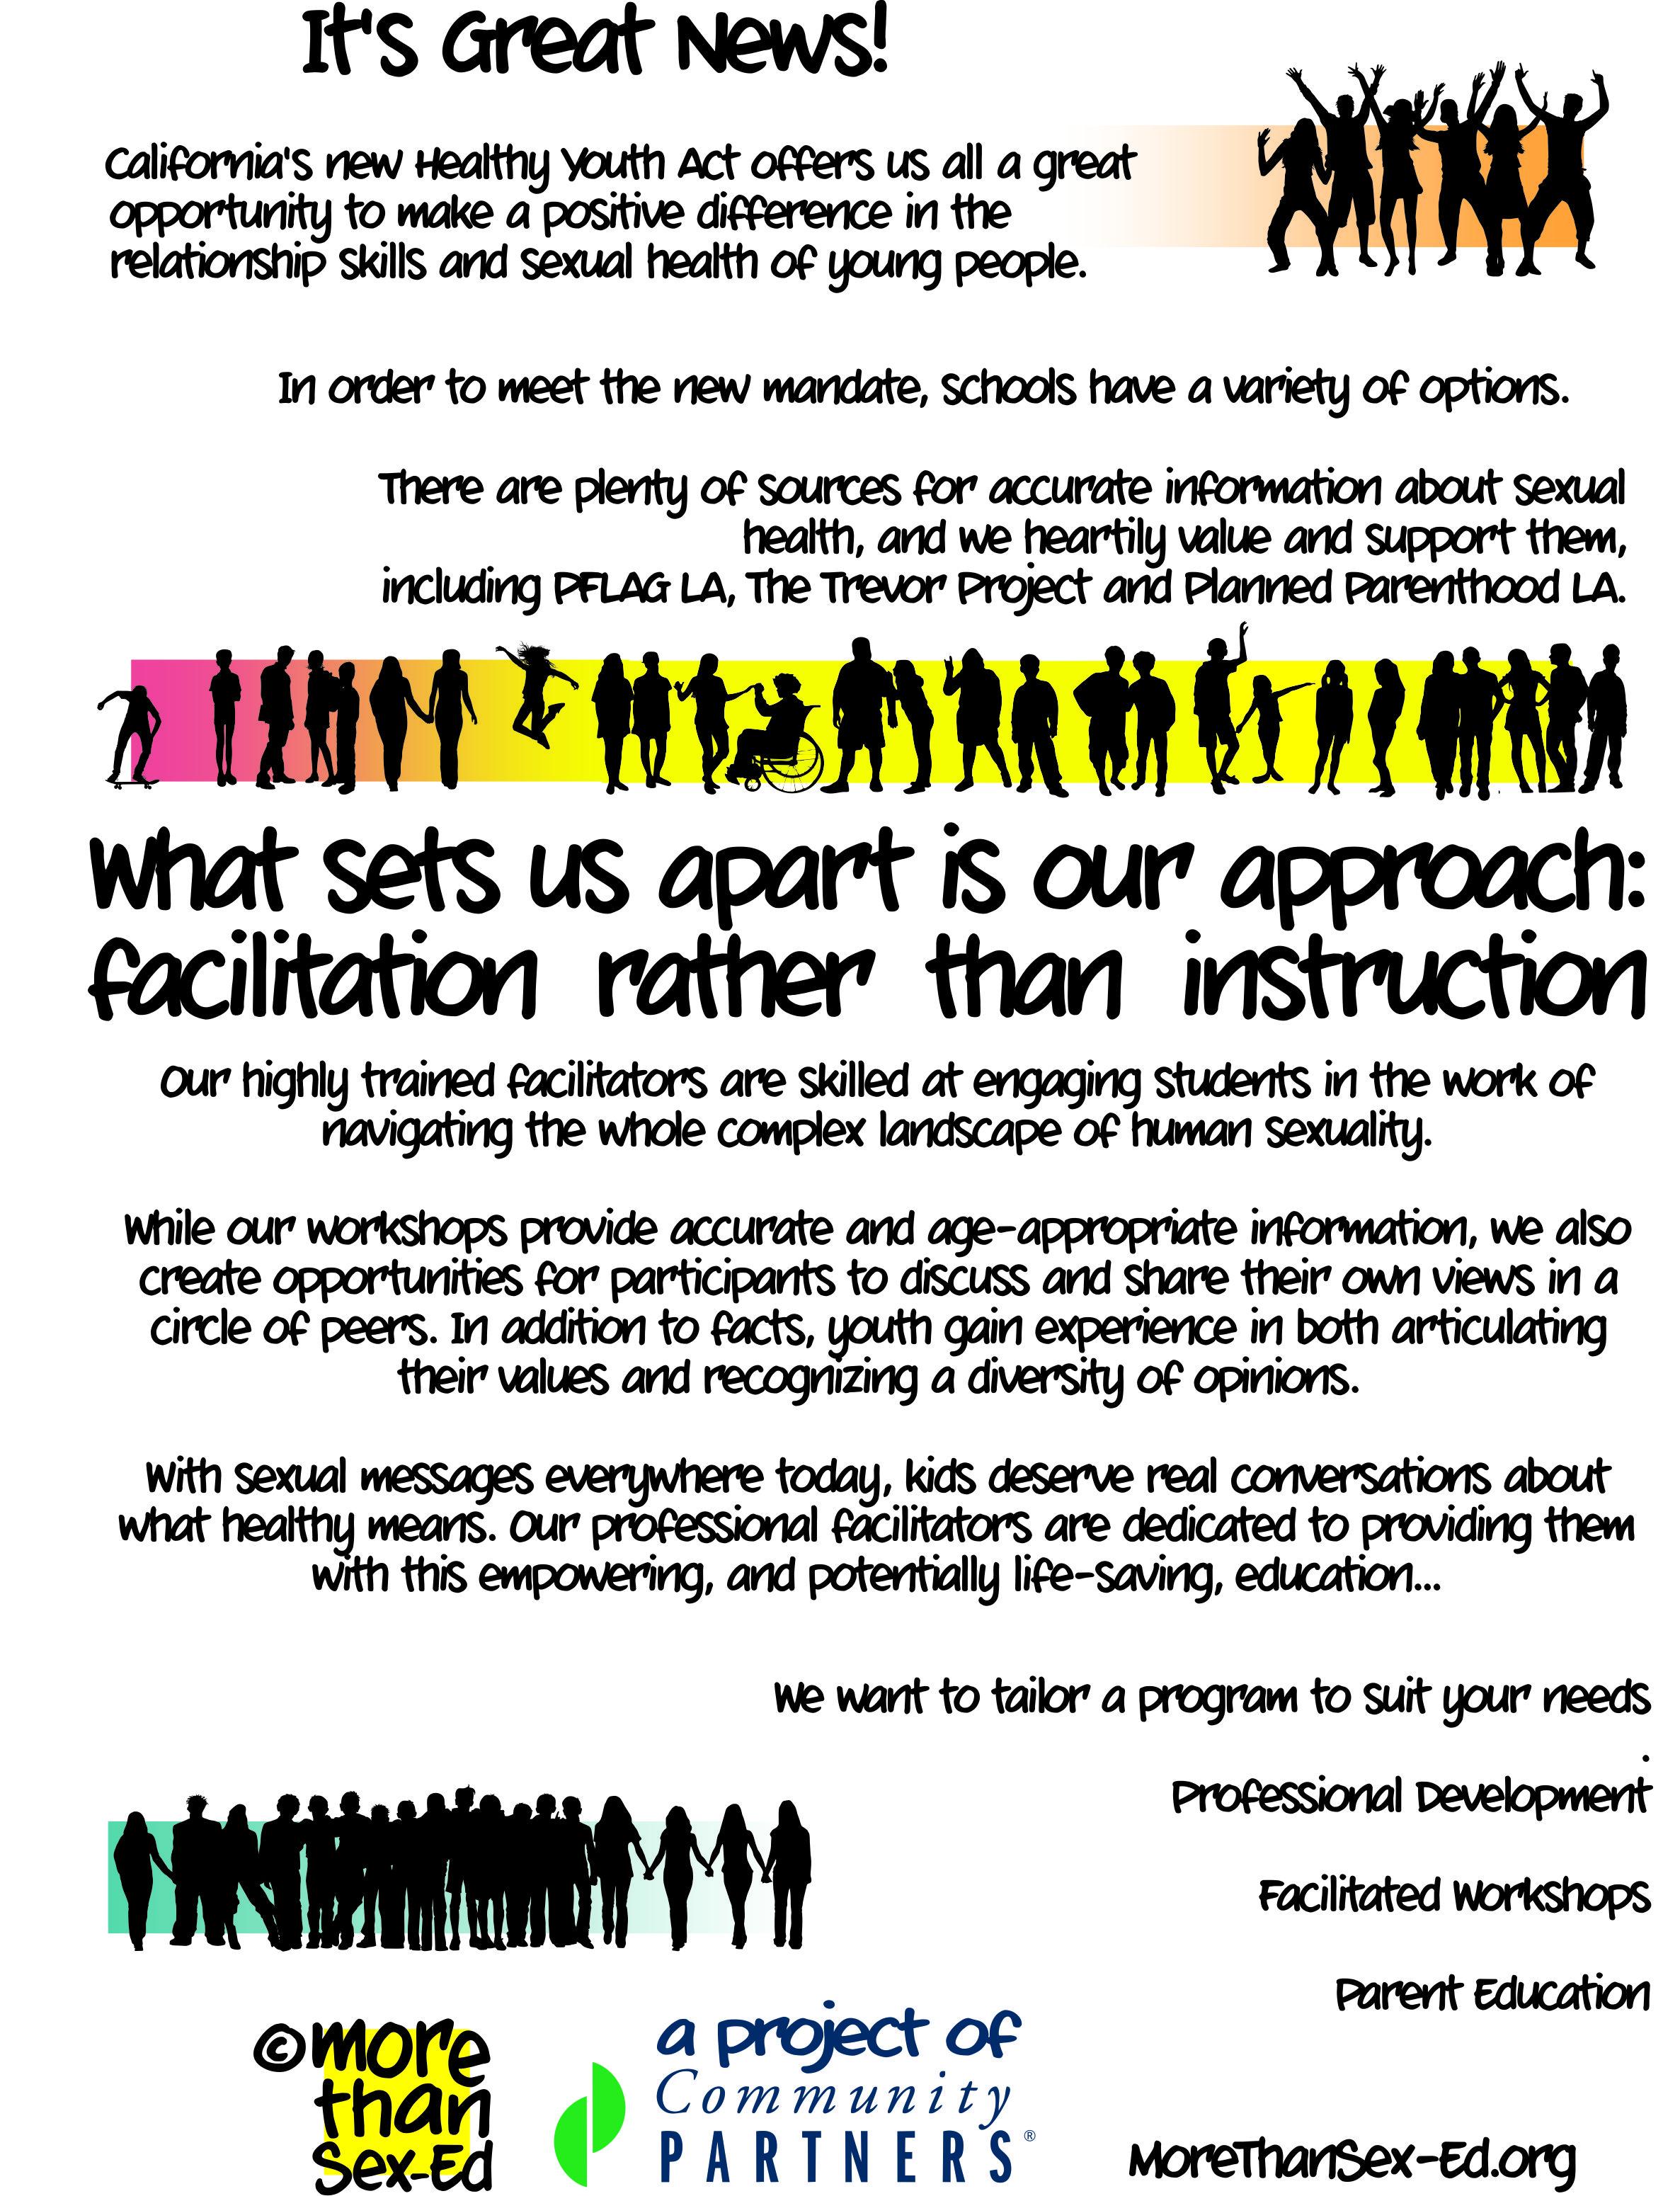 facilitation rather than instruction